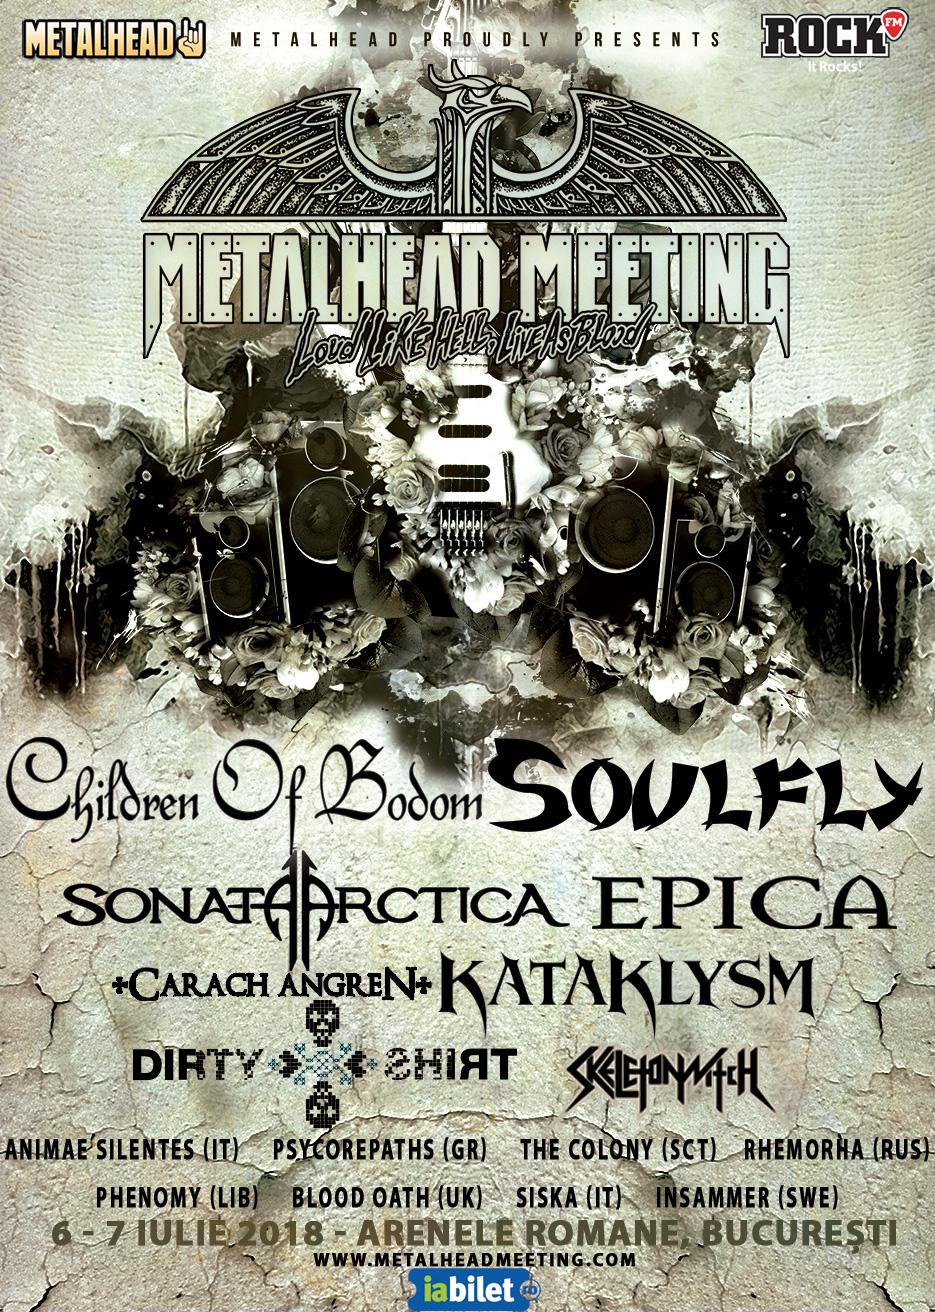 DIRTY SHIRT inchide afisul Metalhead Meeting Festival 2018